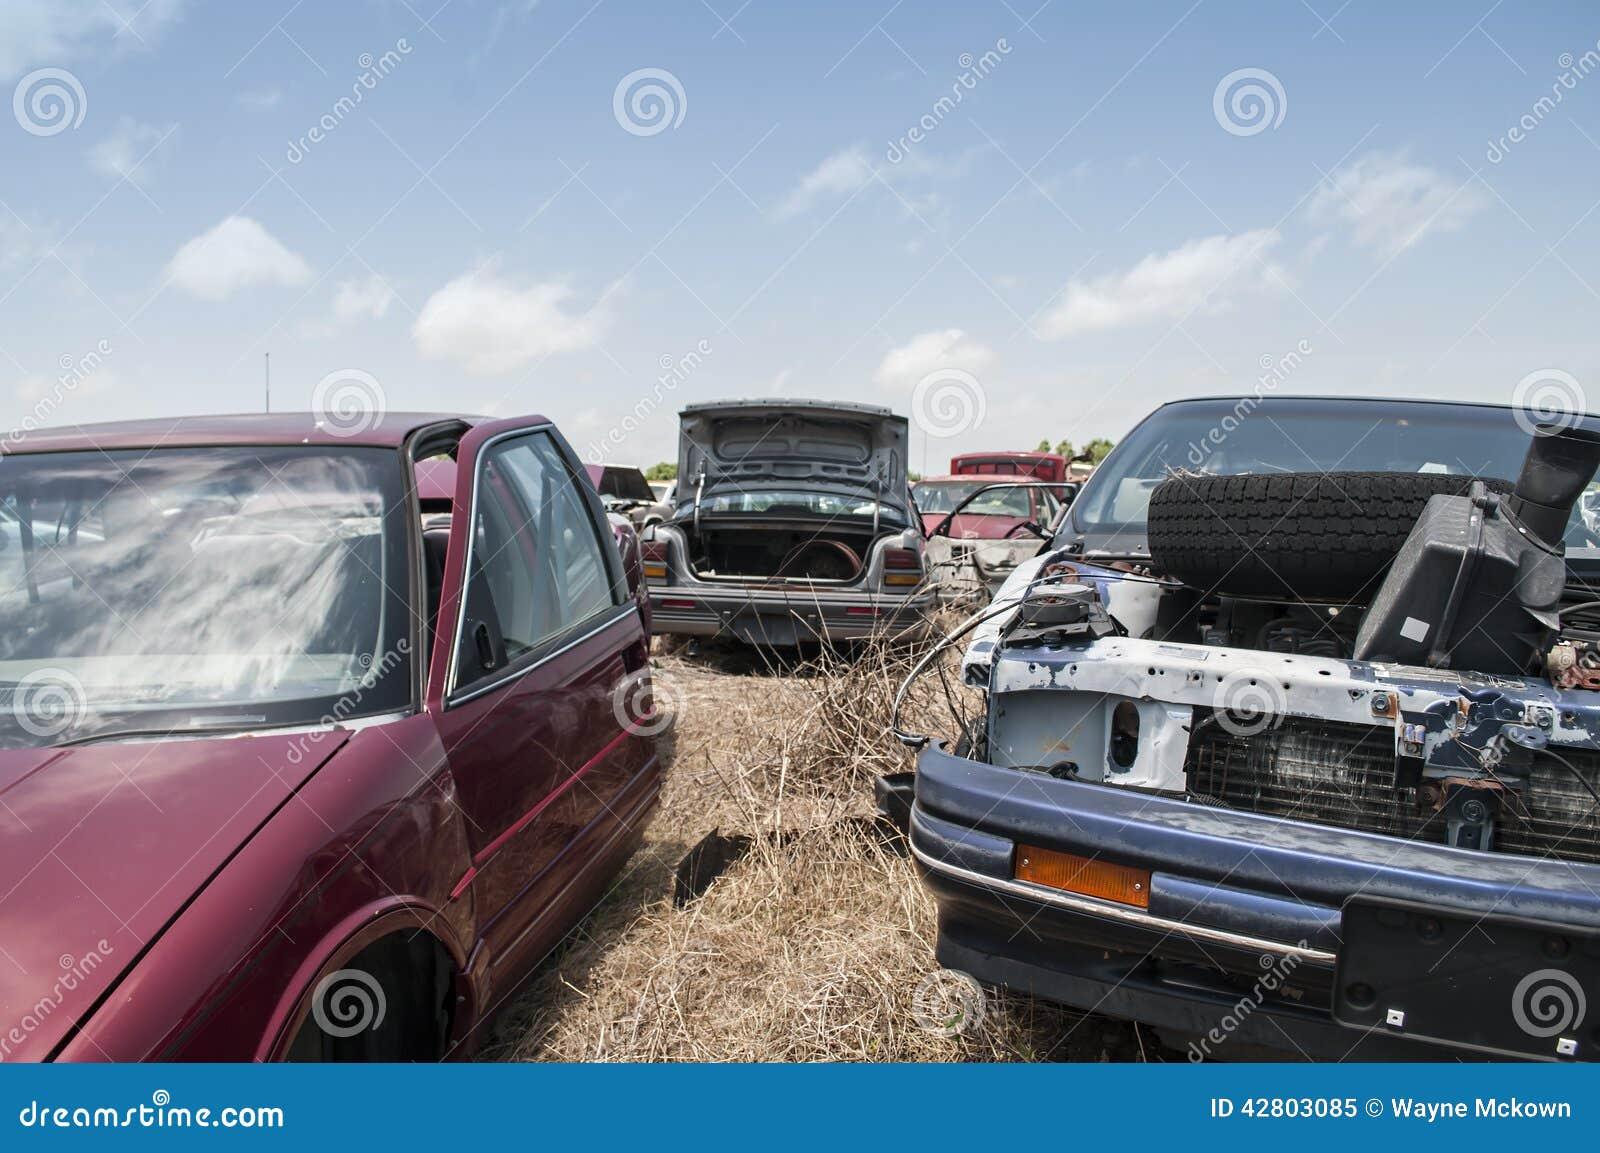 Automobile salvage yard